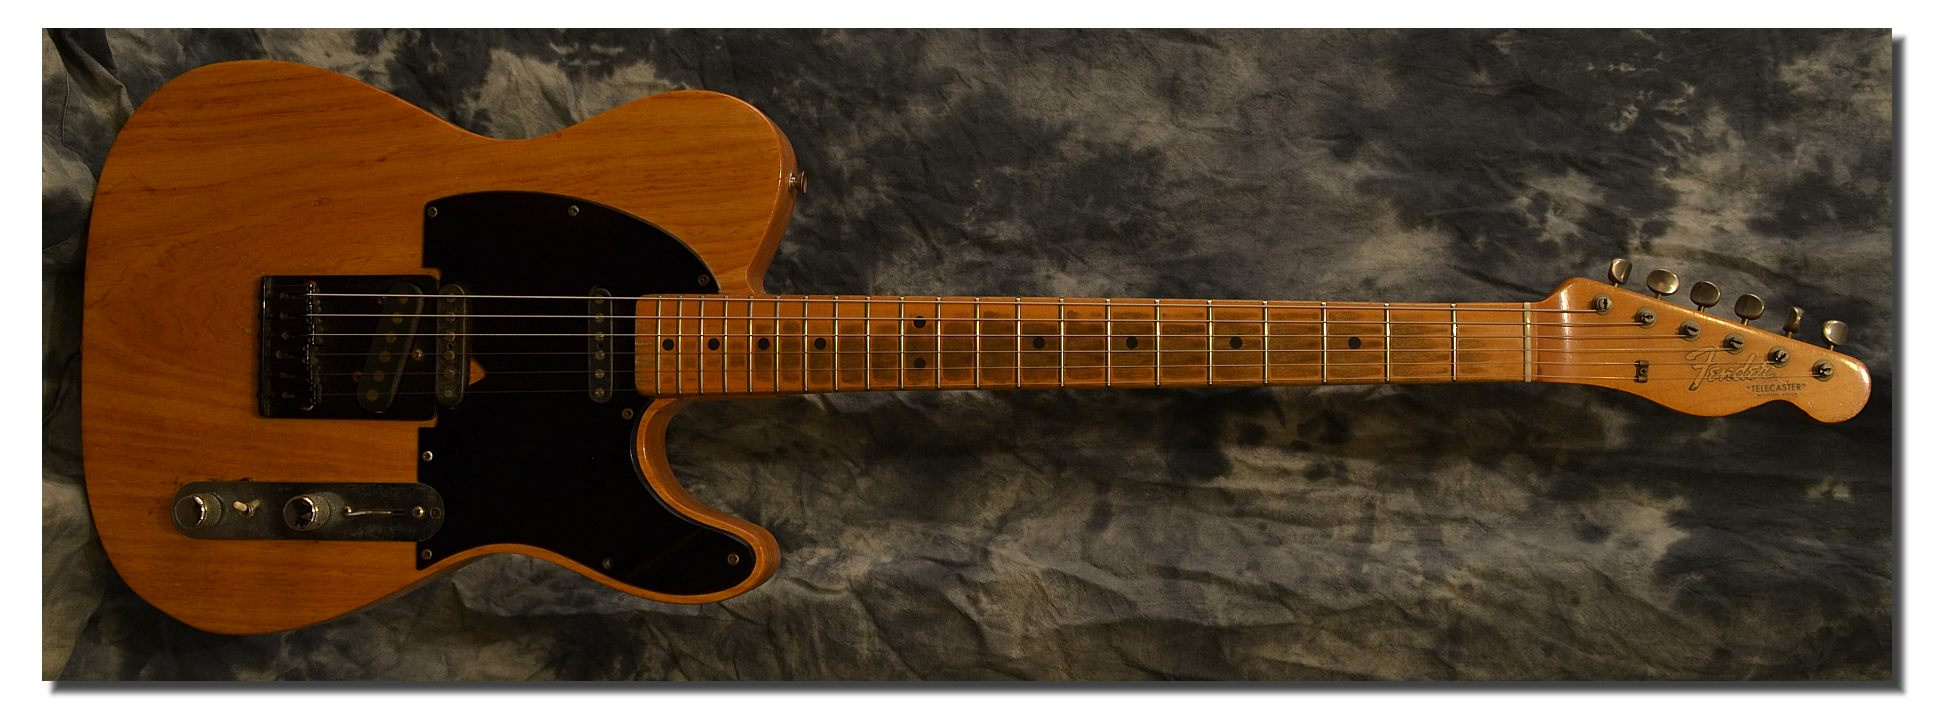 Fender Telecaster Natural 1966 - www.12fret.com